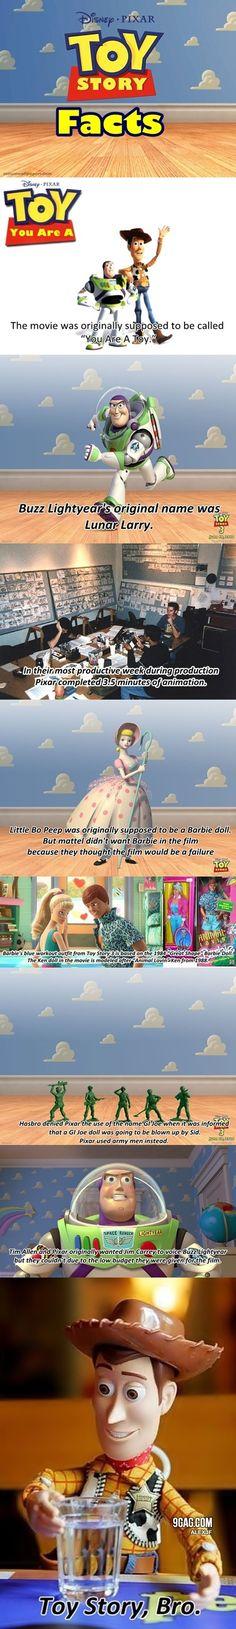 Toy Story #disney #disneysecrets I'm glad they went with Tom hanks for buzz I like Jim Carey but Tom Suits buzz perfectly